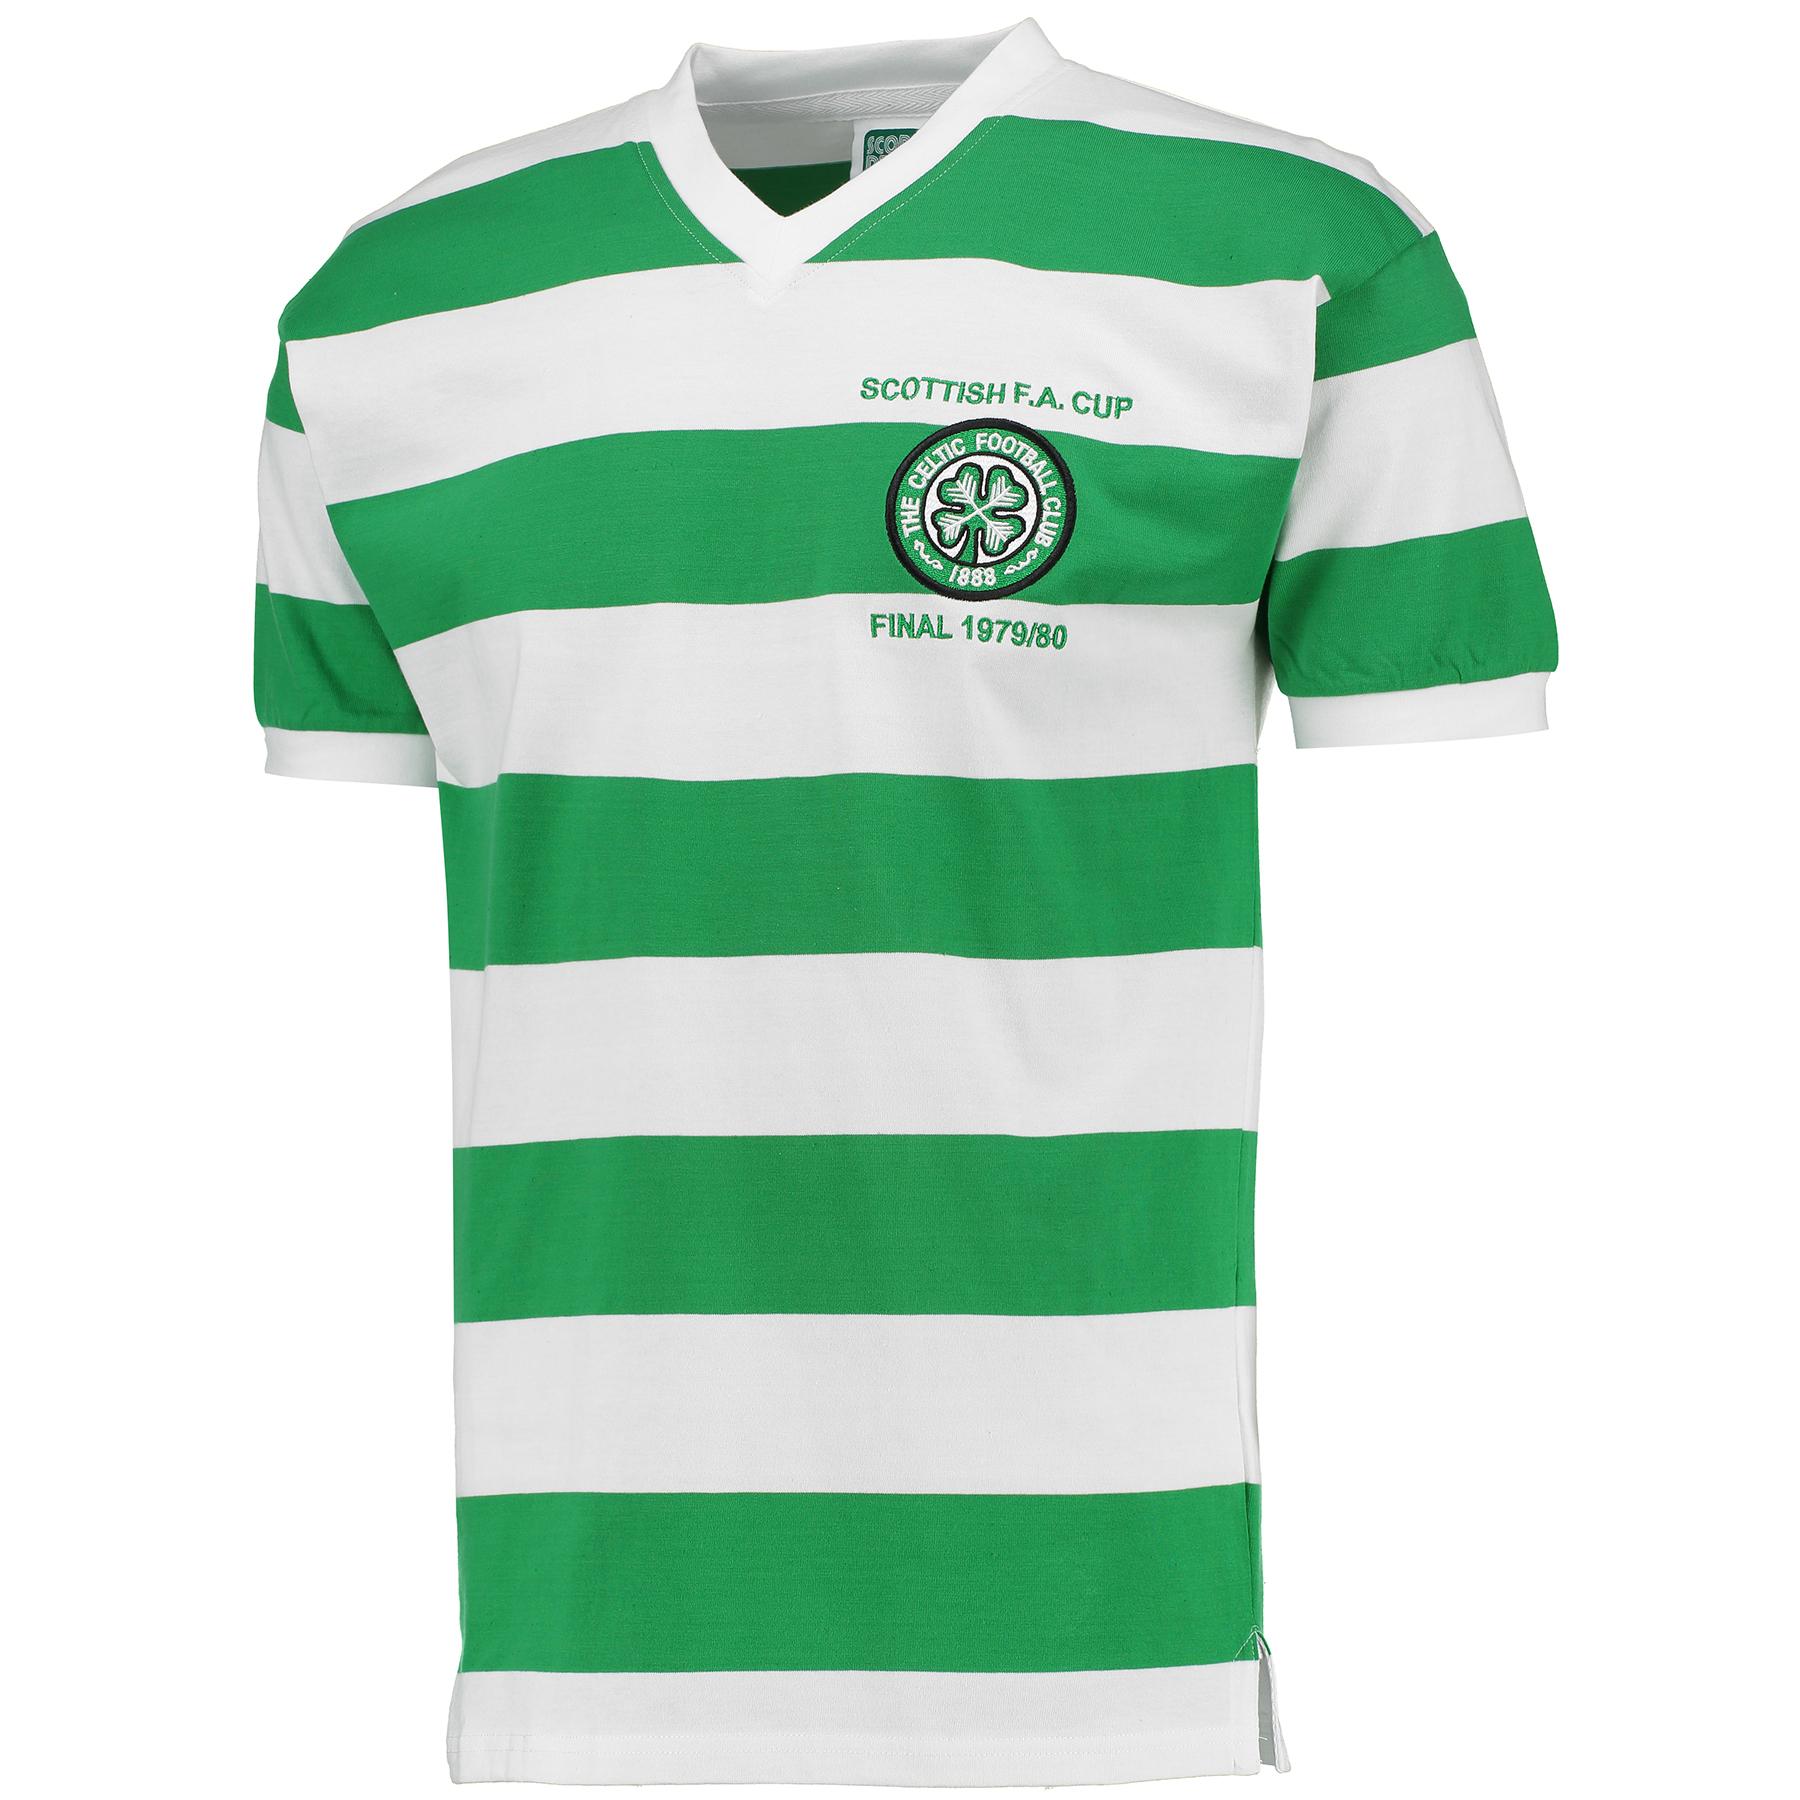 Celtic 1980 Scottish Cup Final shirt